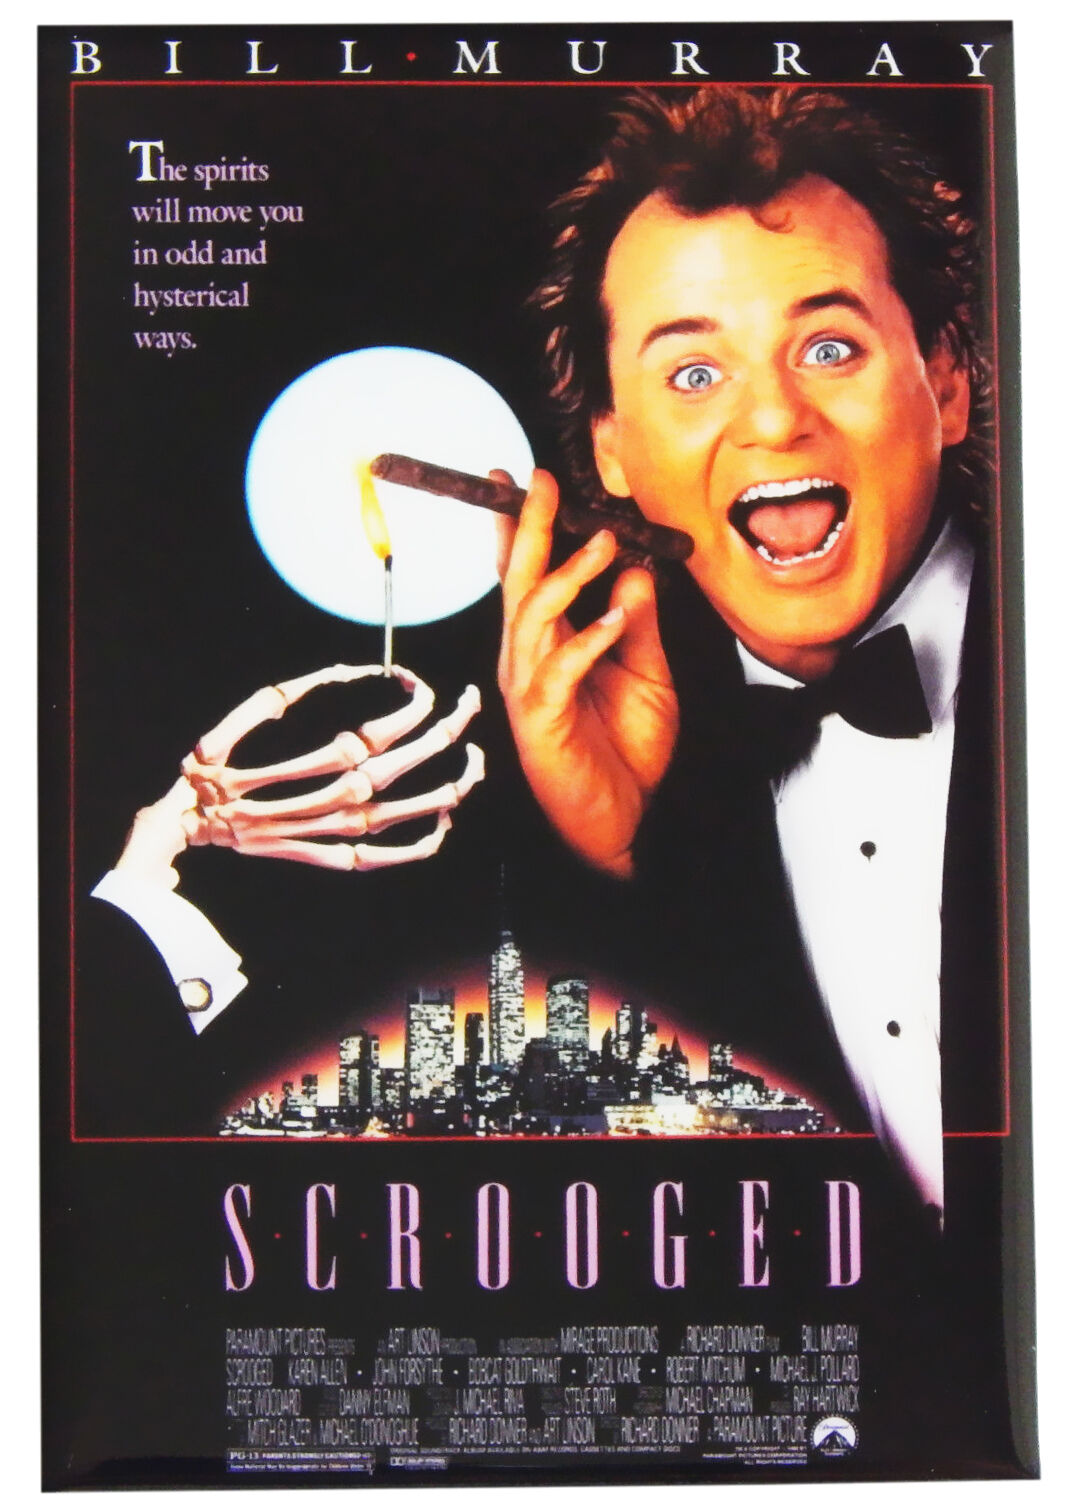 Top 10 Bill Murray Movies | eBay